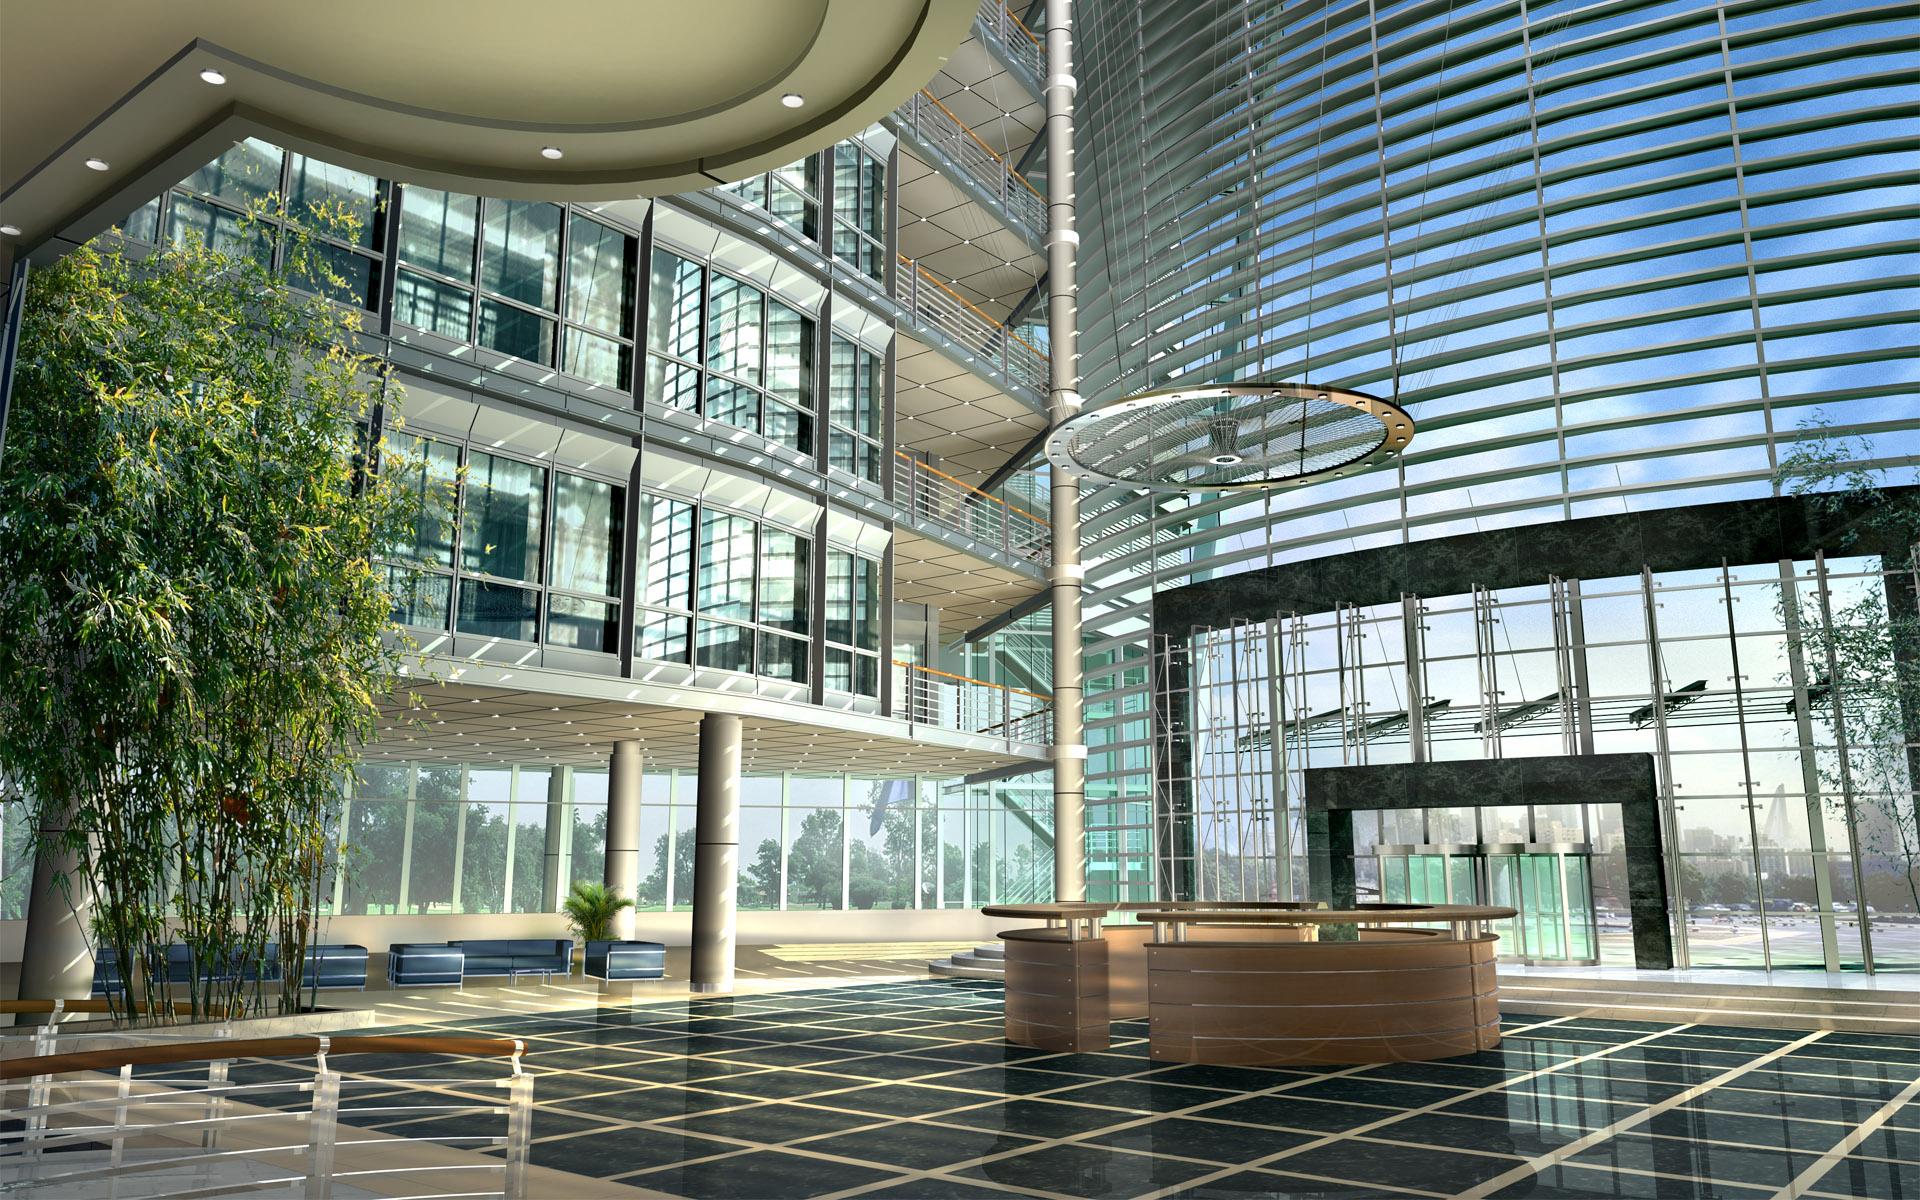 download glass buildings wallpaper - photo #17